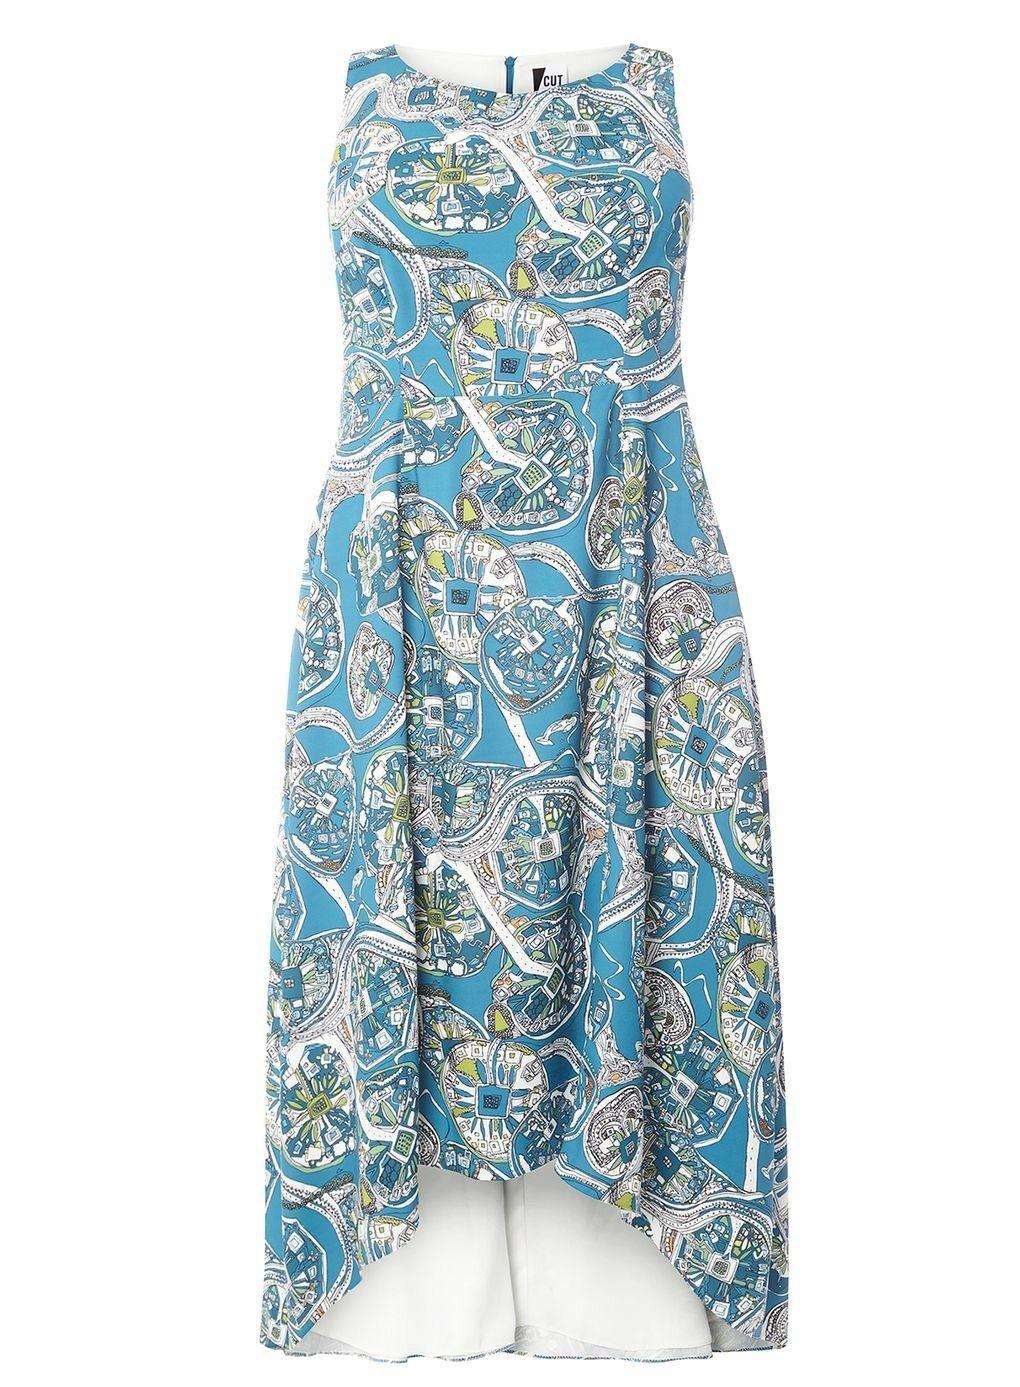 Cut For Evans jewel print high low midi bluee teal dress plus curve 22